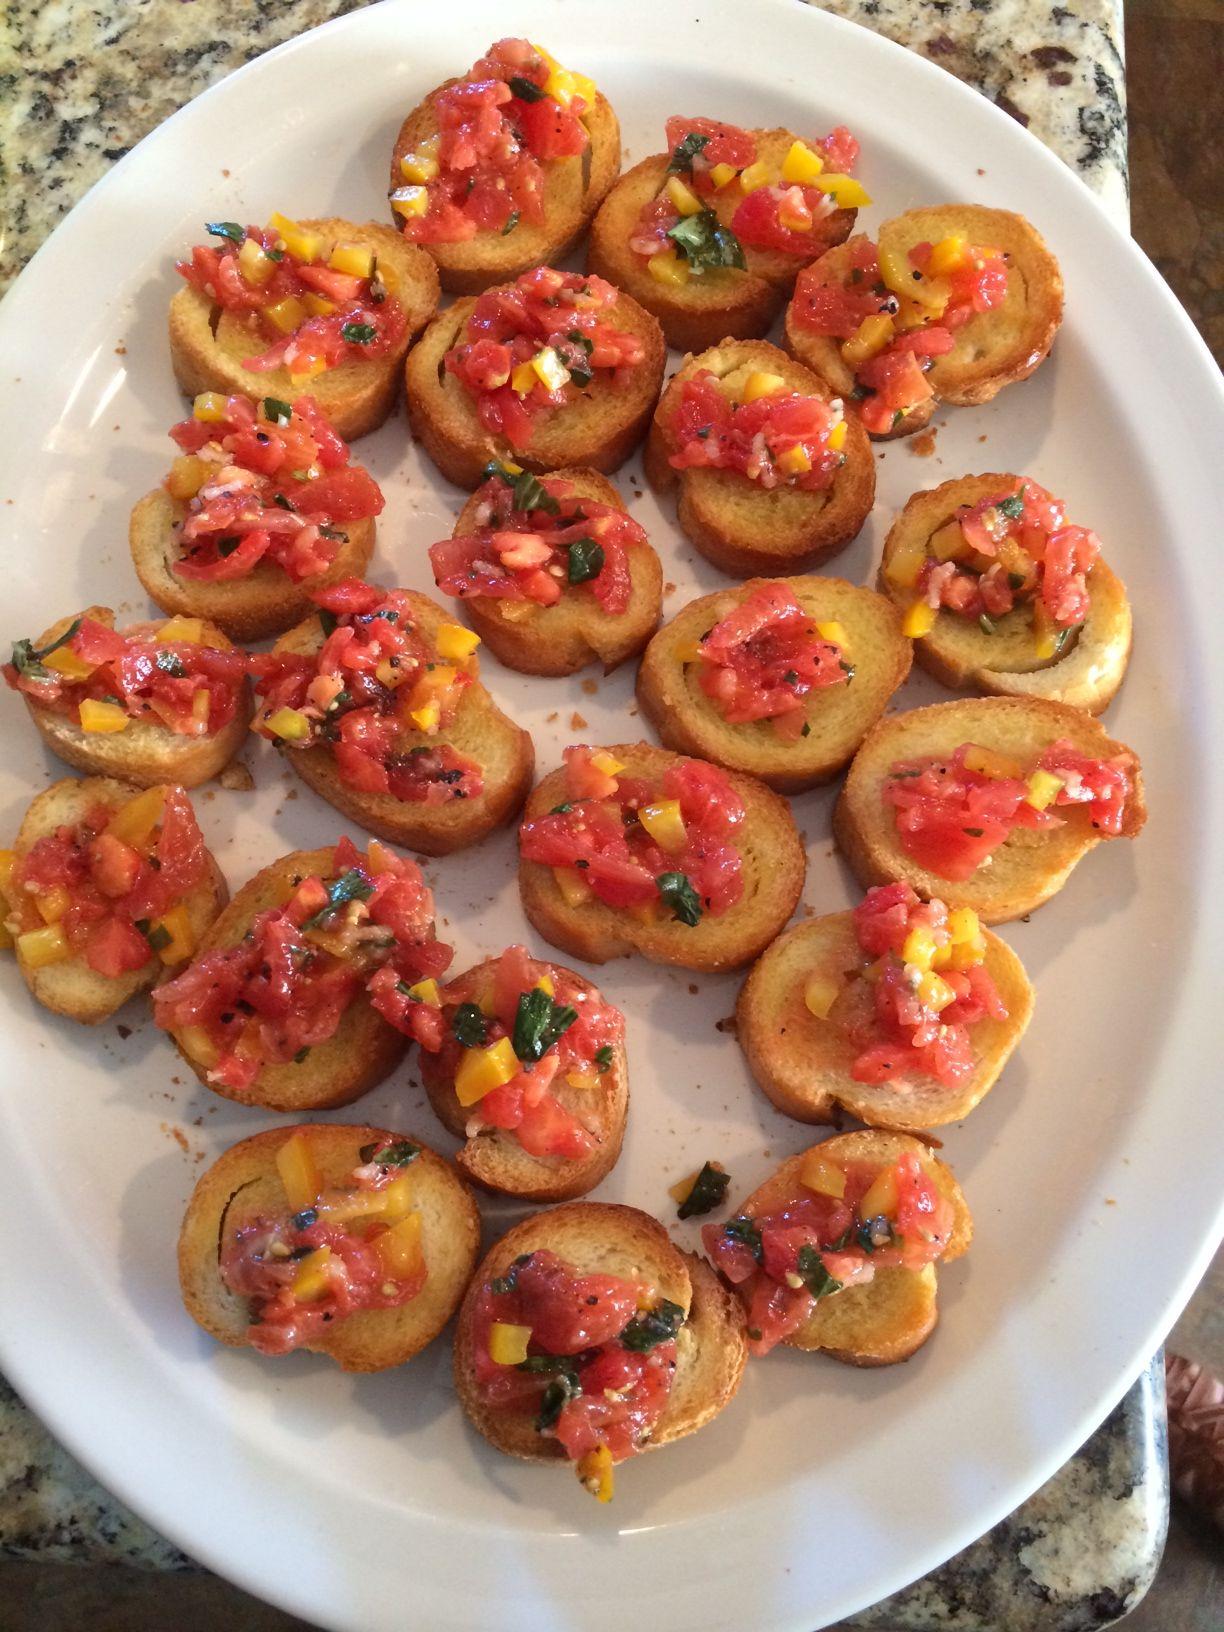 Bruschetta tomato basil yellow pepper olive oil rice